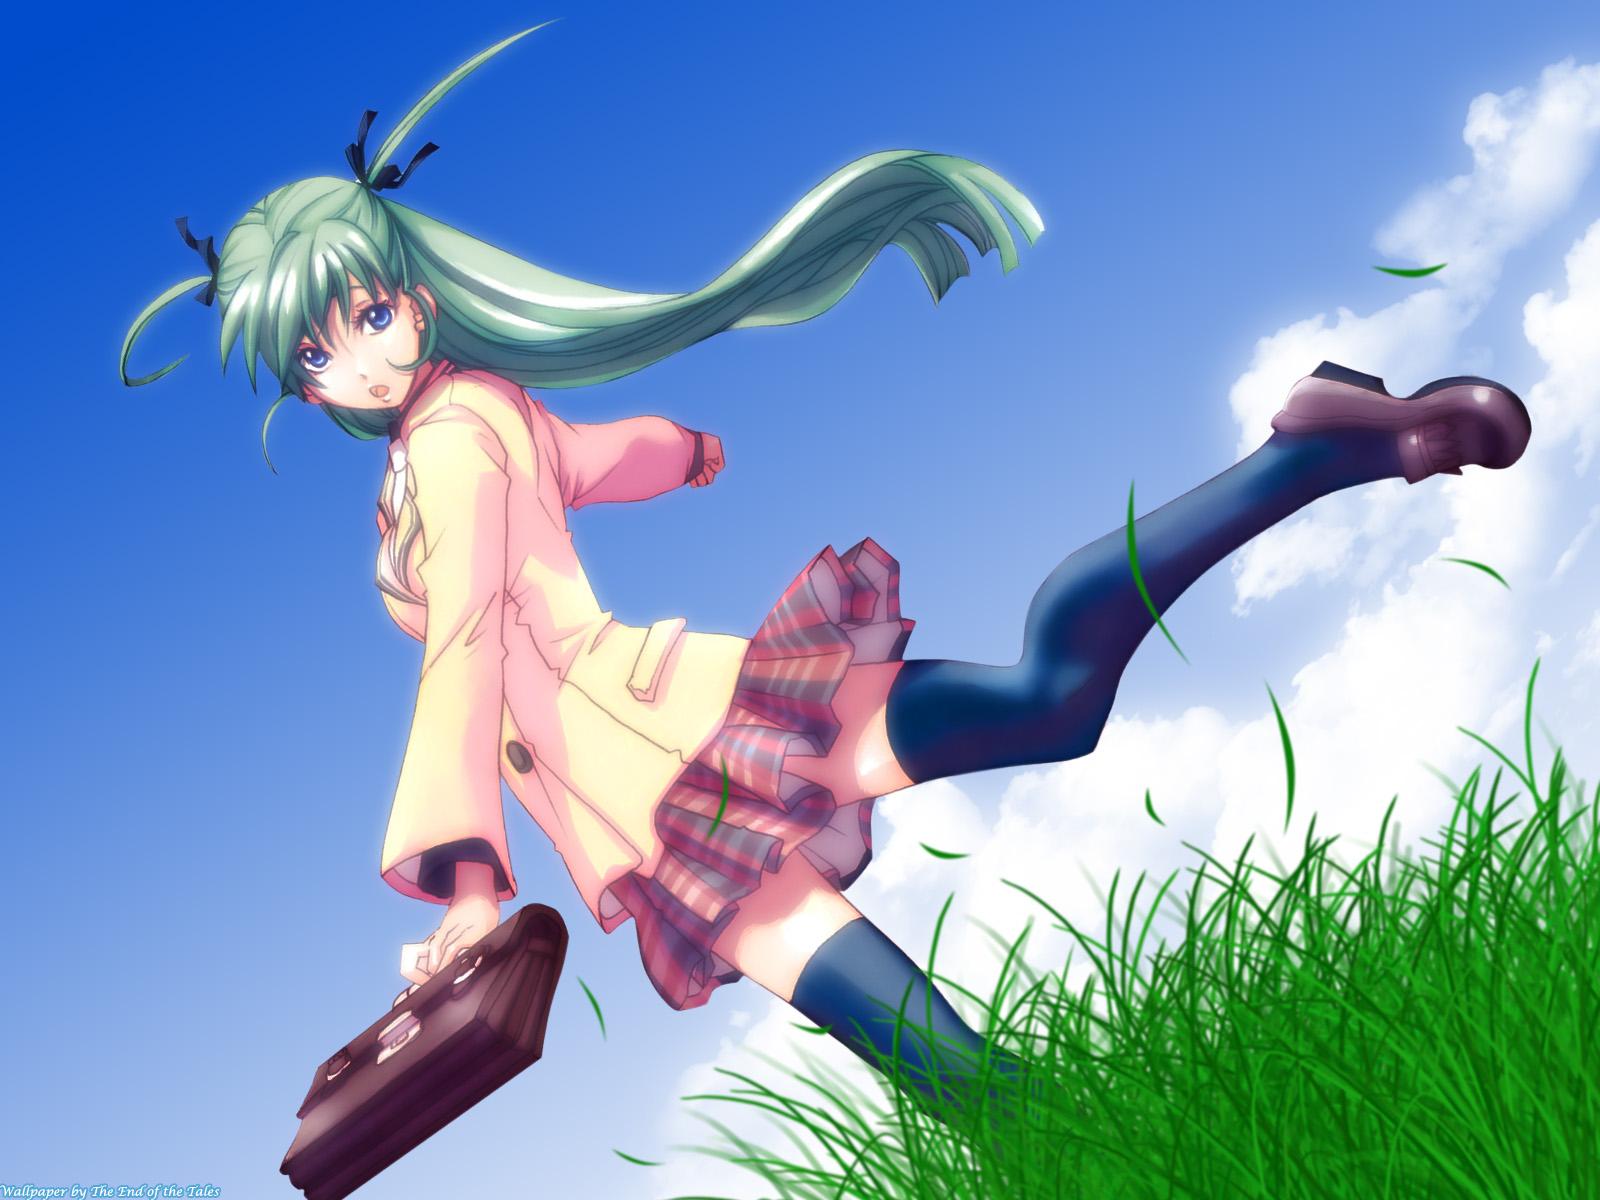 Anime 1600x1200 anime girls anime Hatsune Miku